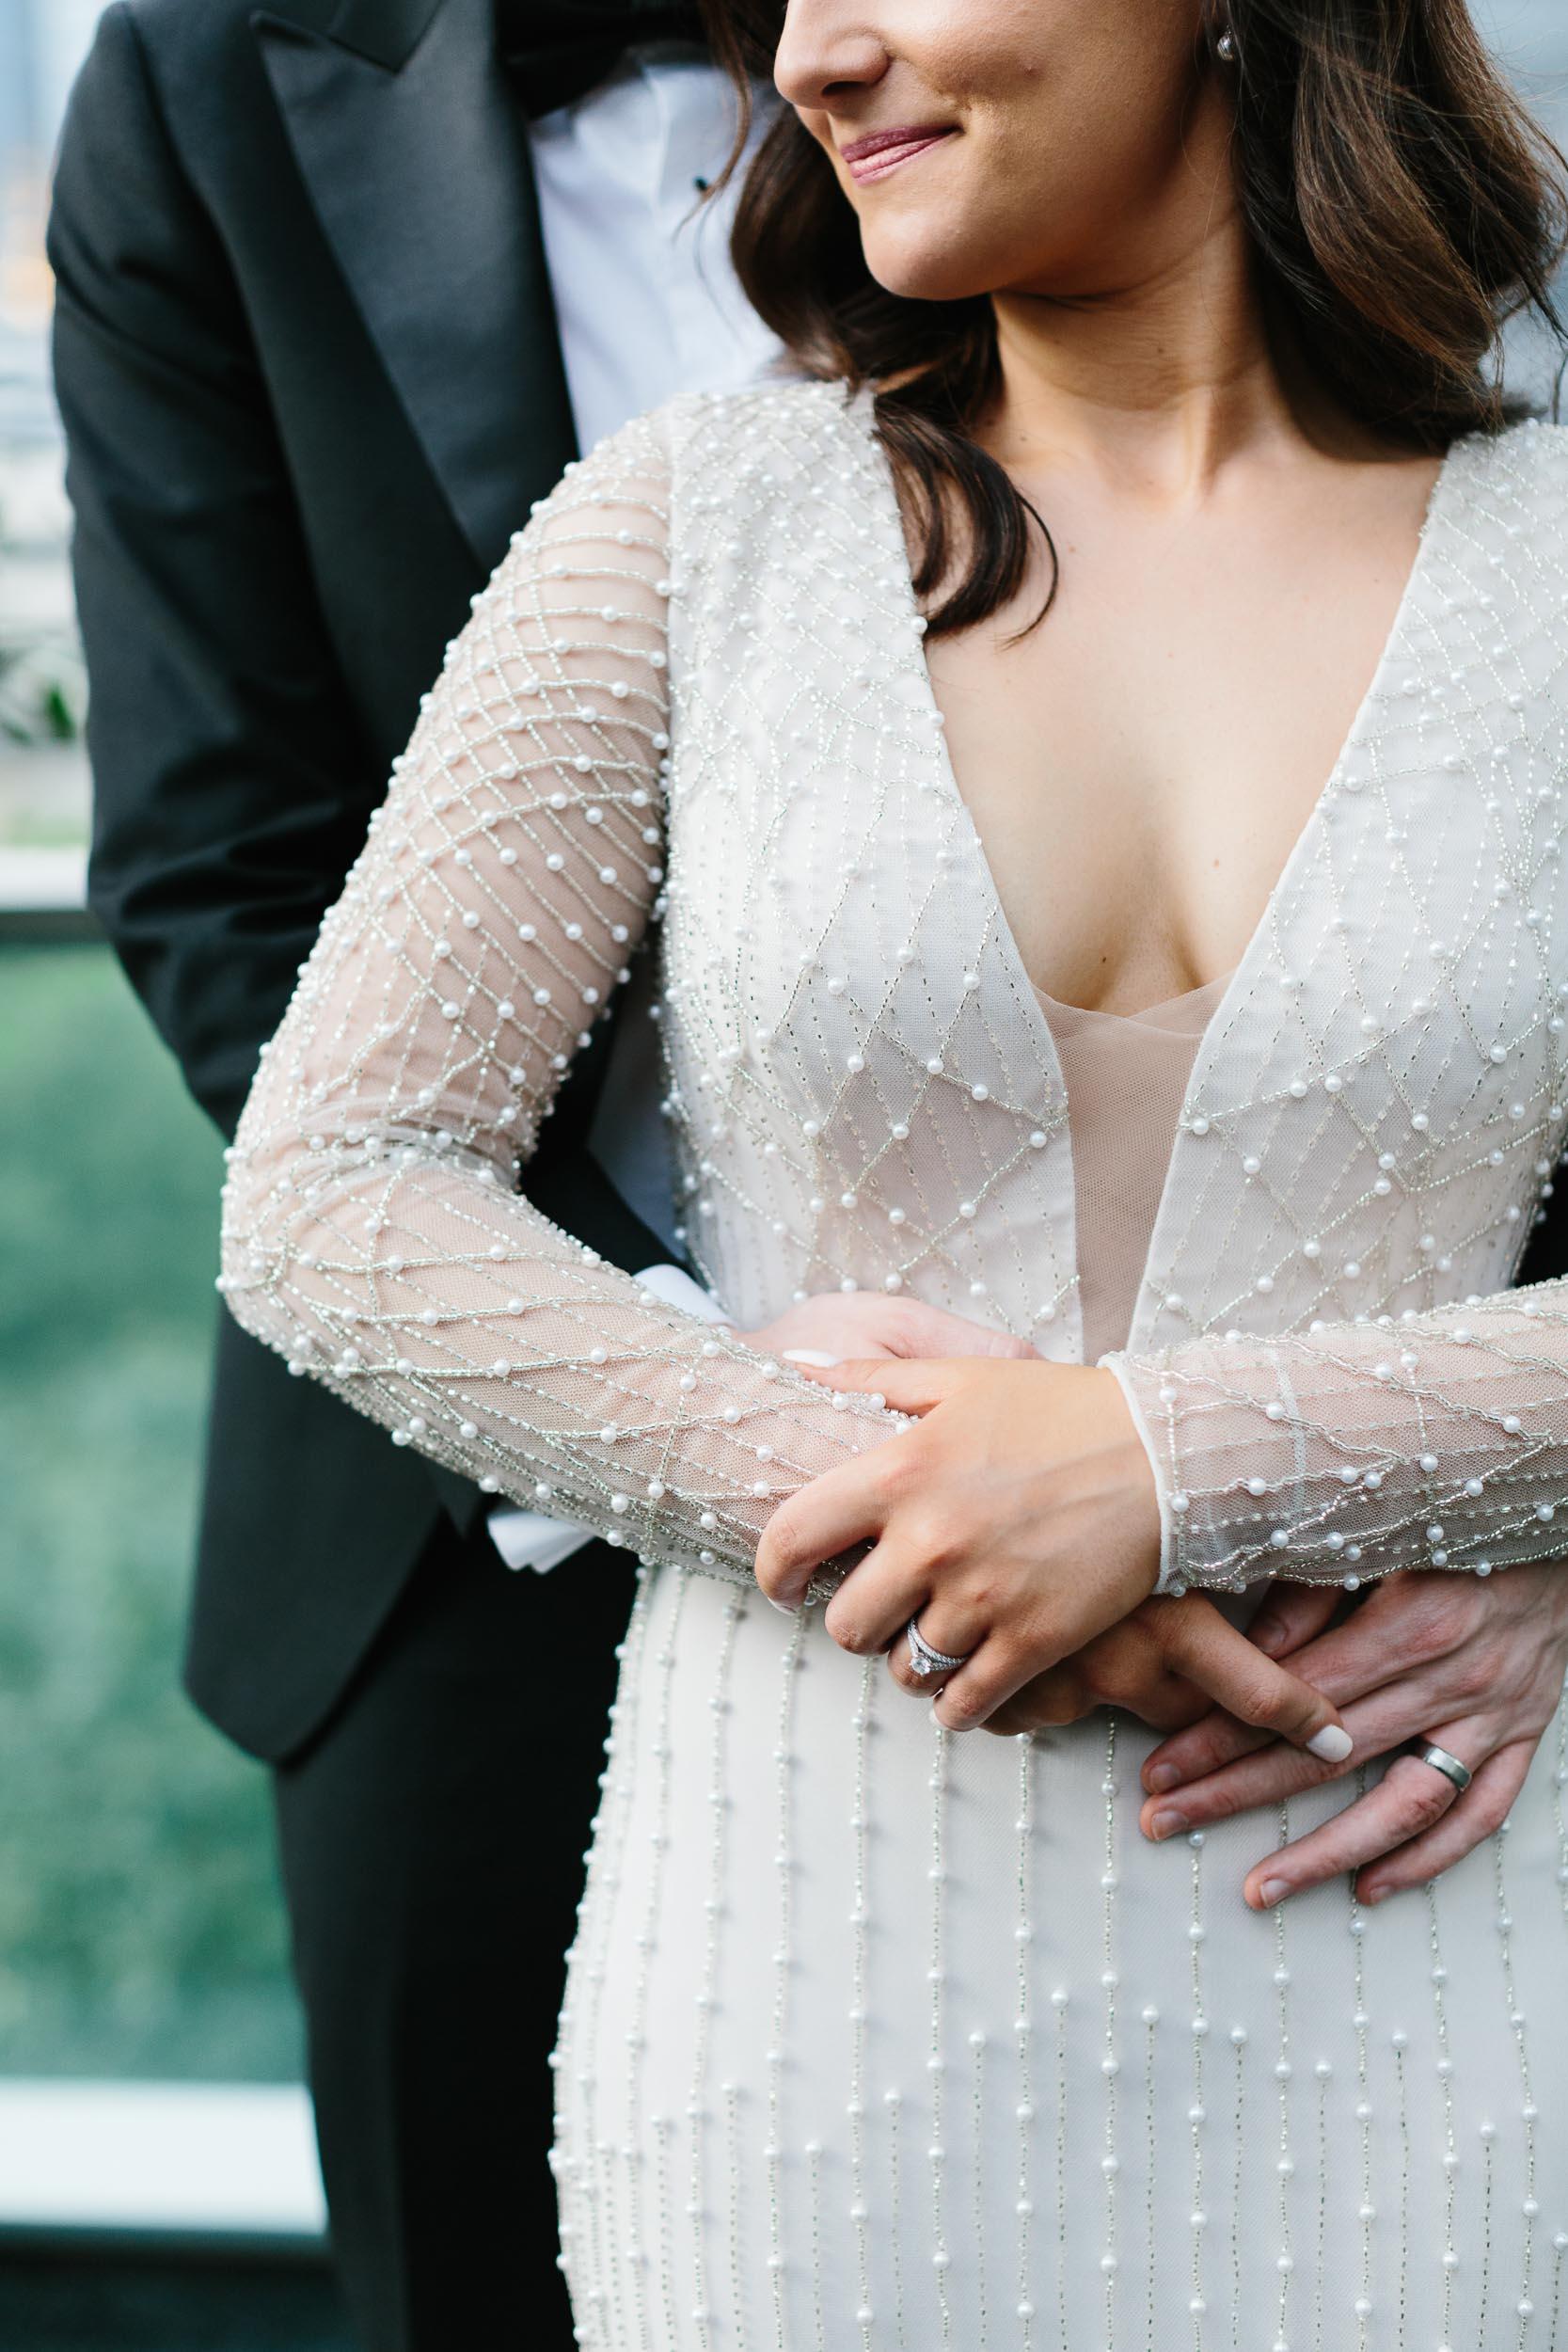 Kas-Richards-Wedding-Photographer-Melbourne-City-Wedding-Alto-Event-Space-Jane-Hill-Bridal-Gown-62.jpg